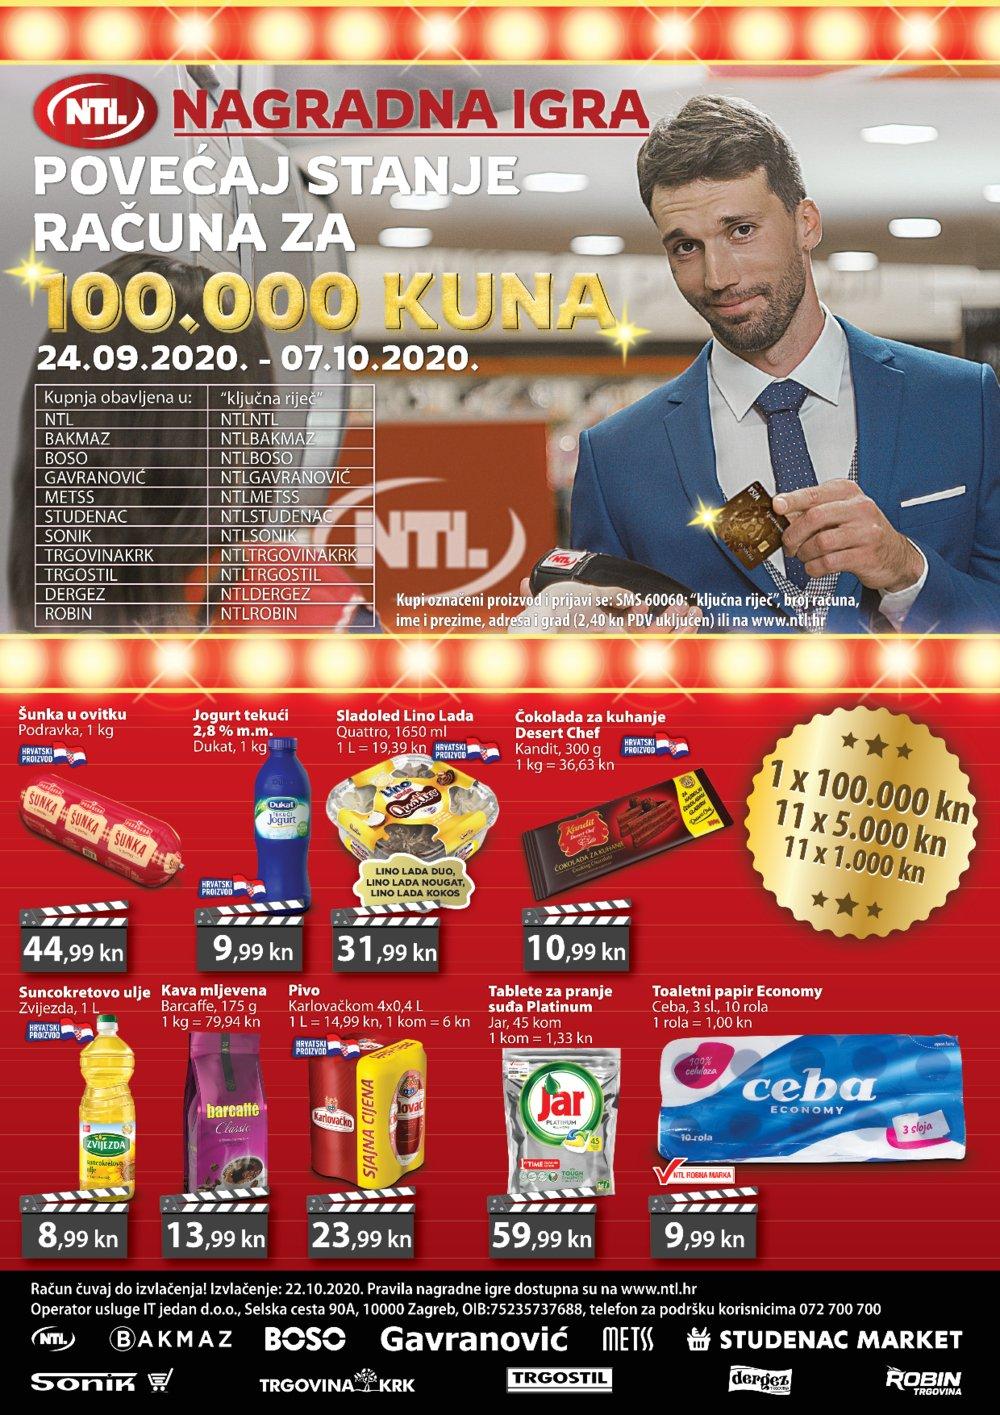 Studenac katalog NTL Maxi Tjedna ponuda 24.09.-30.09.2020.